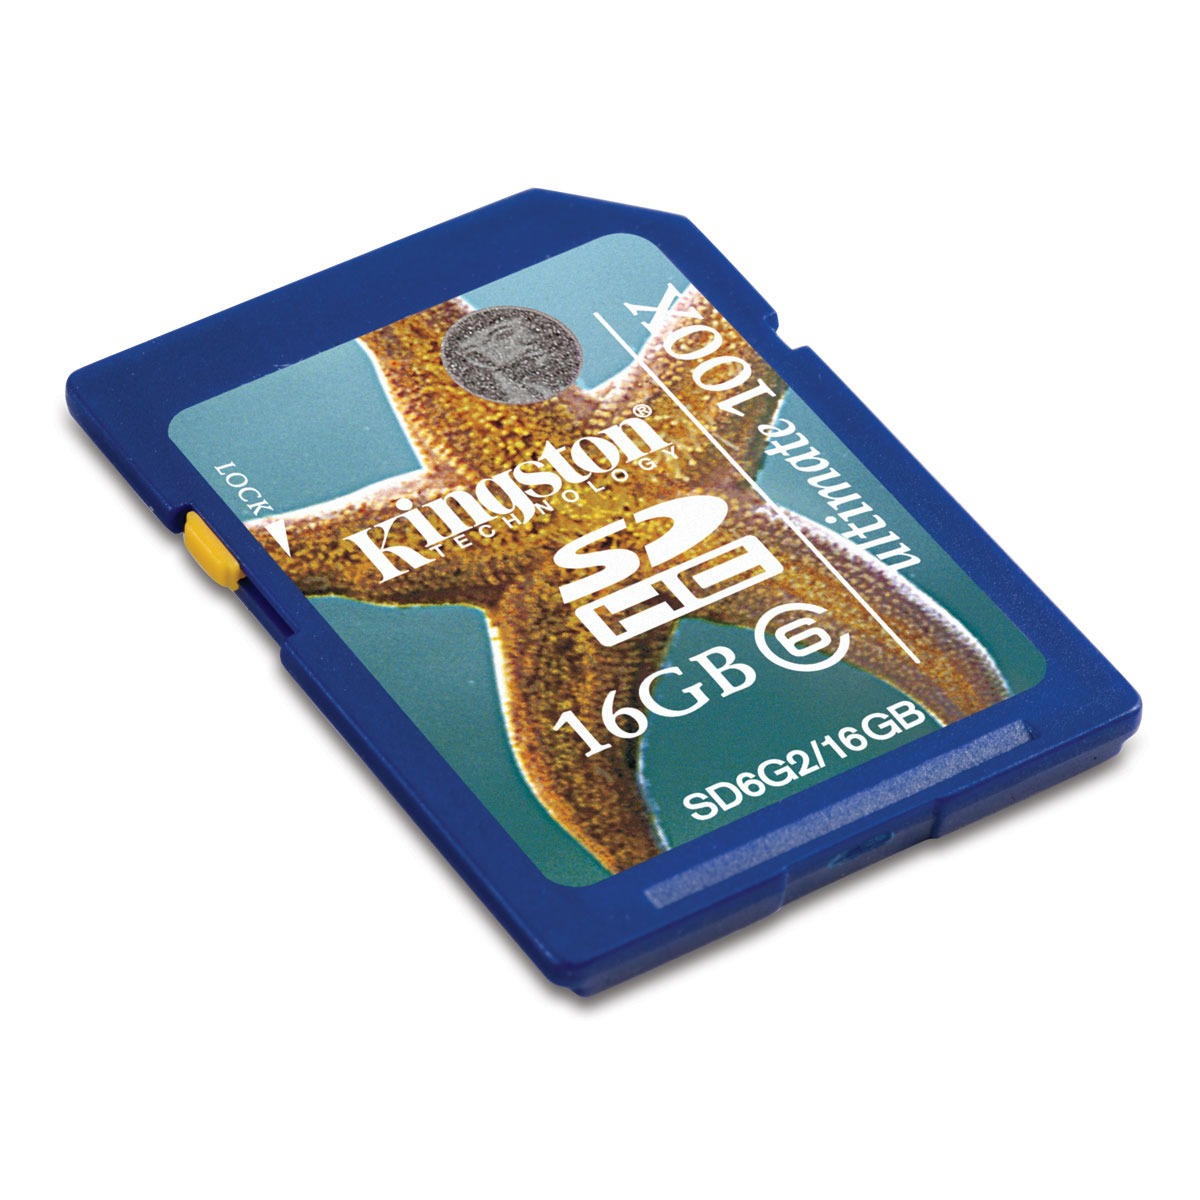 Carte mémoire Kingston SDHC Class 6 Ultimate 16 GB Kingston SDHC Ultimate 16 Go - Class 6 (garantie 10 ans par Kingston)